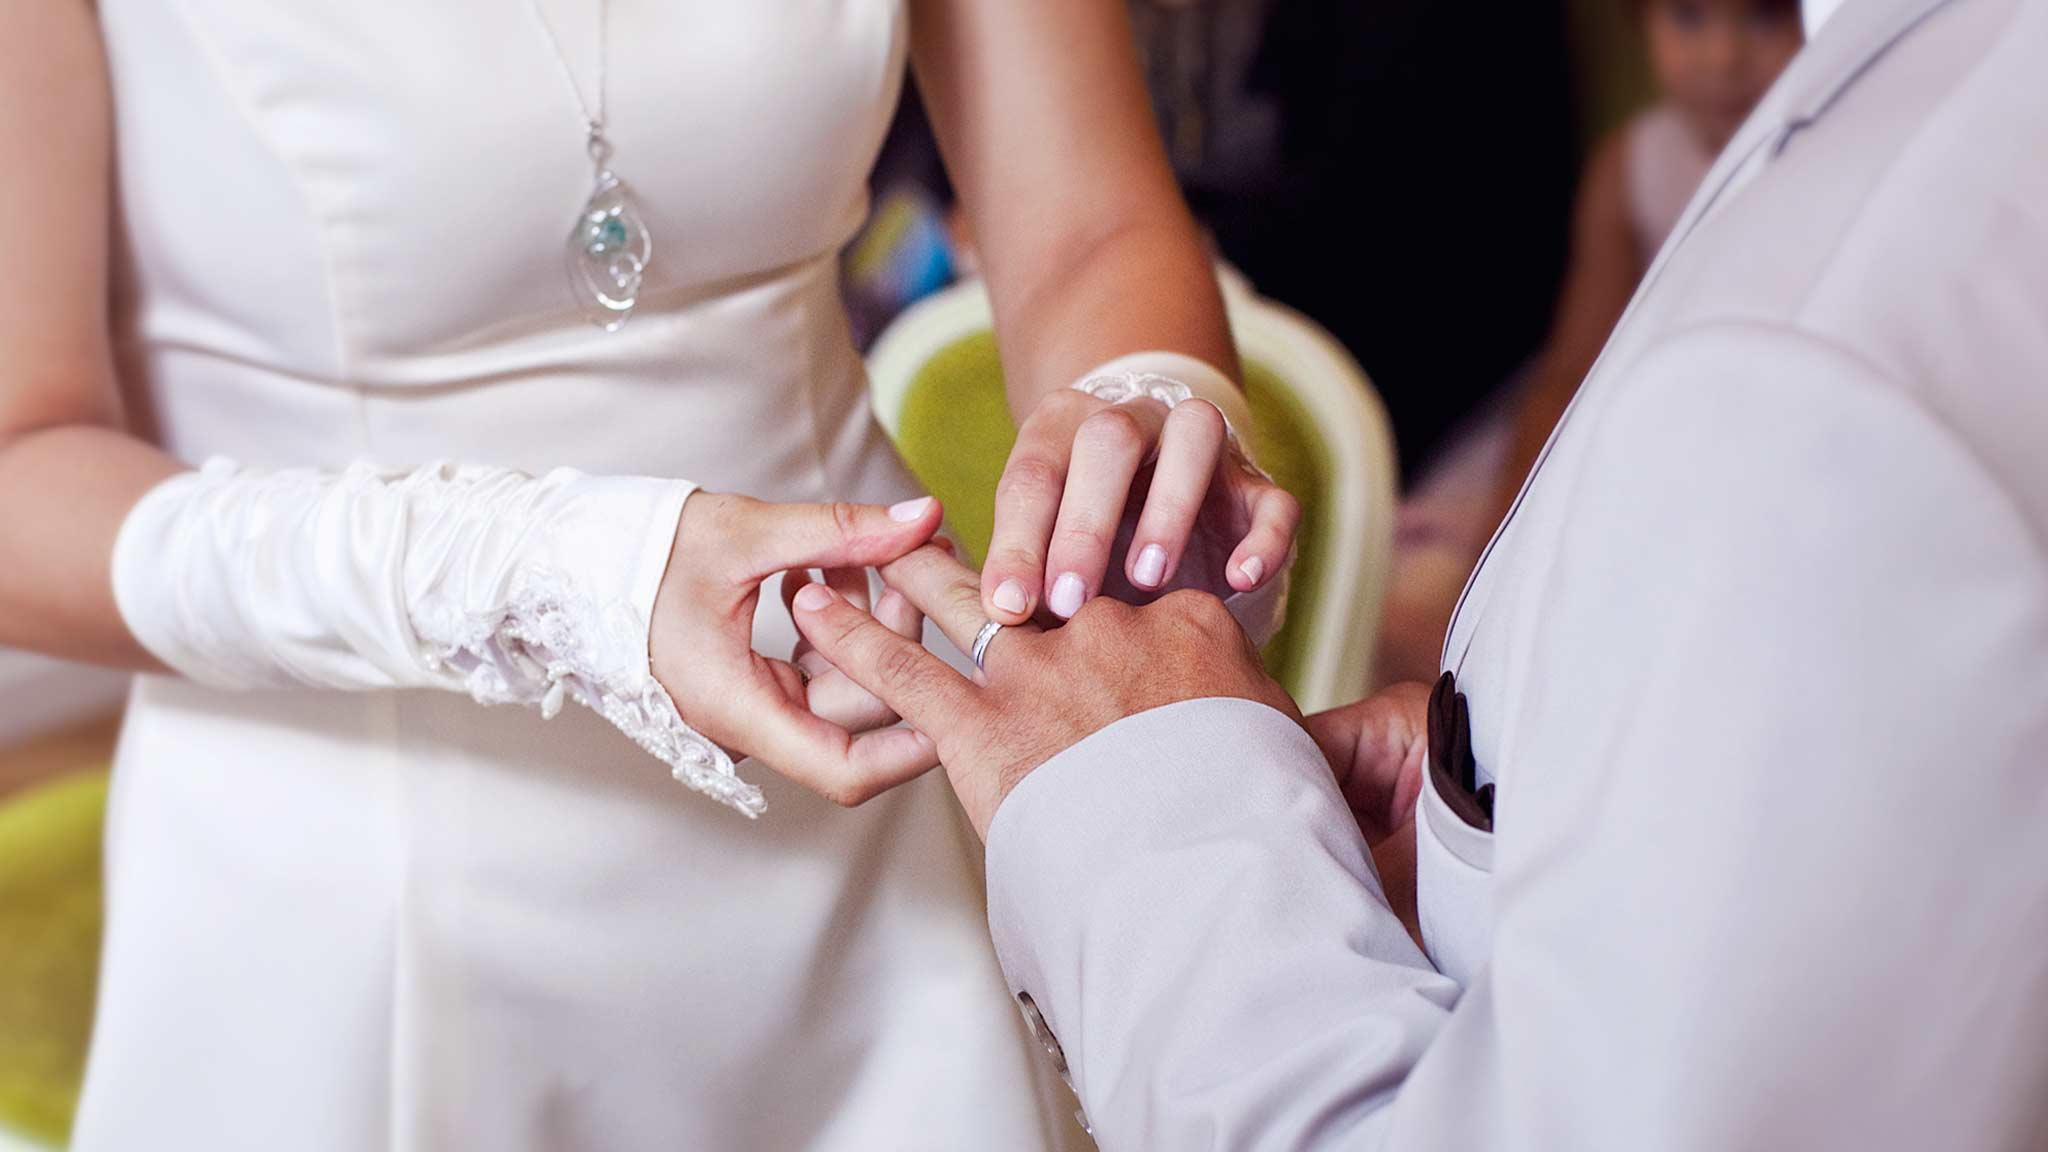 mairie-bague-au-doigt-alliances-photographe-mariage-nancy-metz-strasbourg-engagement-rings-wedding-photographer